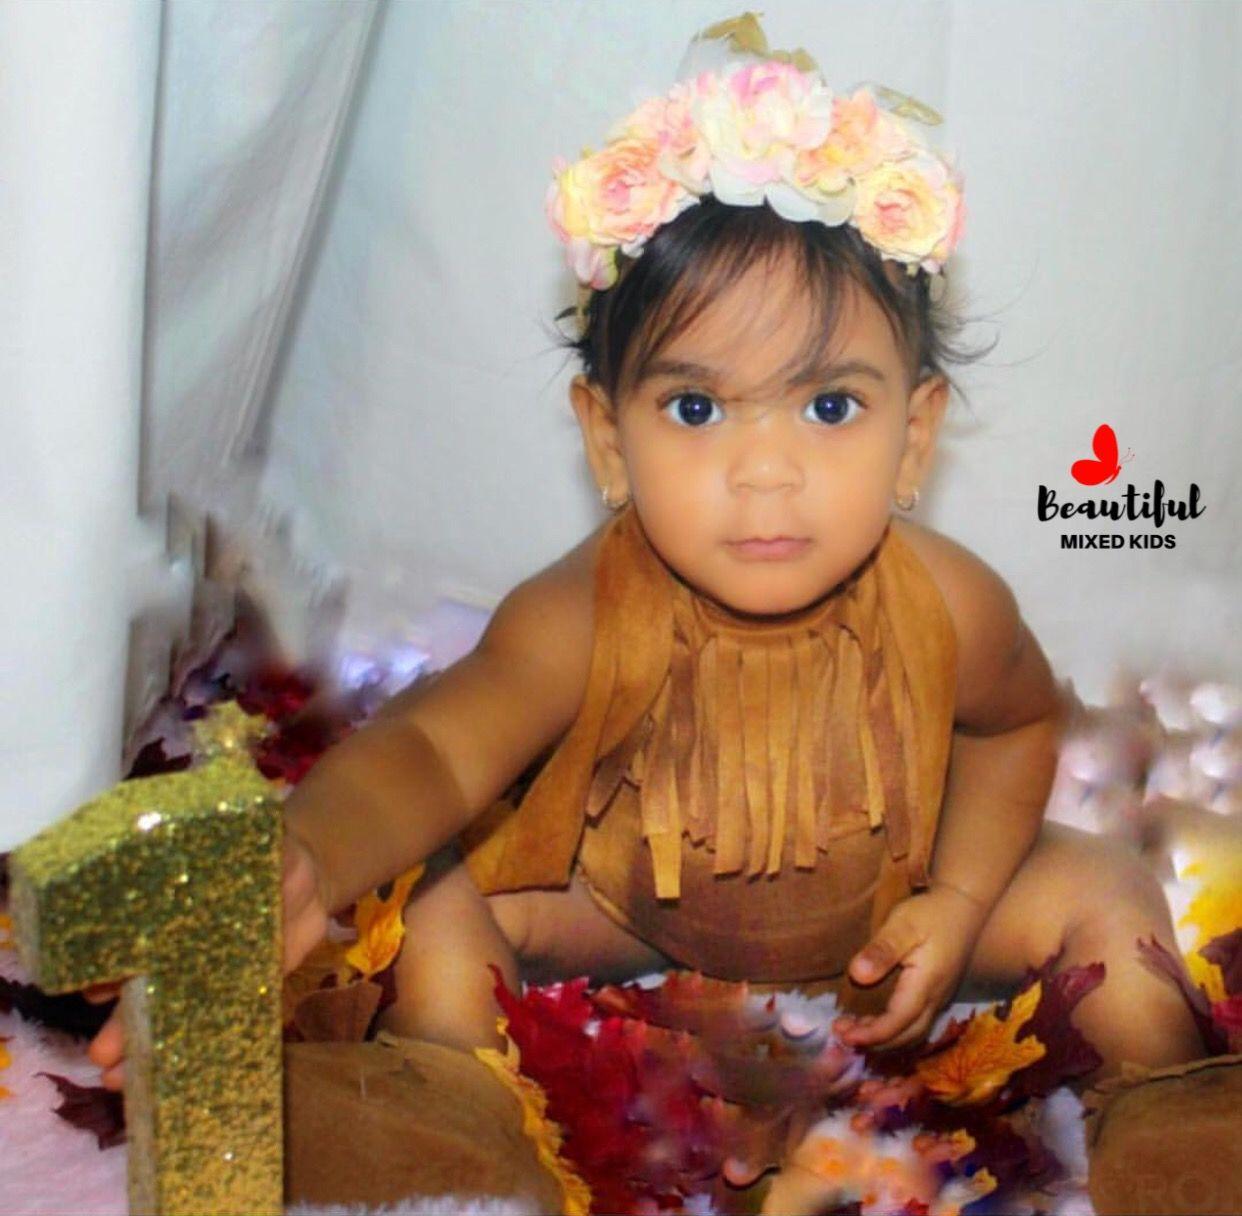 avalynn reign - 11 months • puerto rician & african american